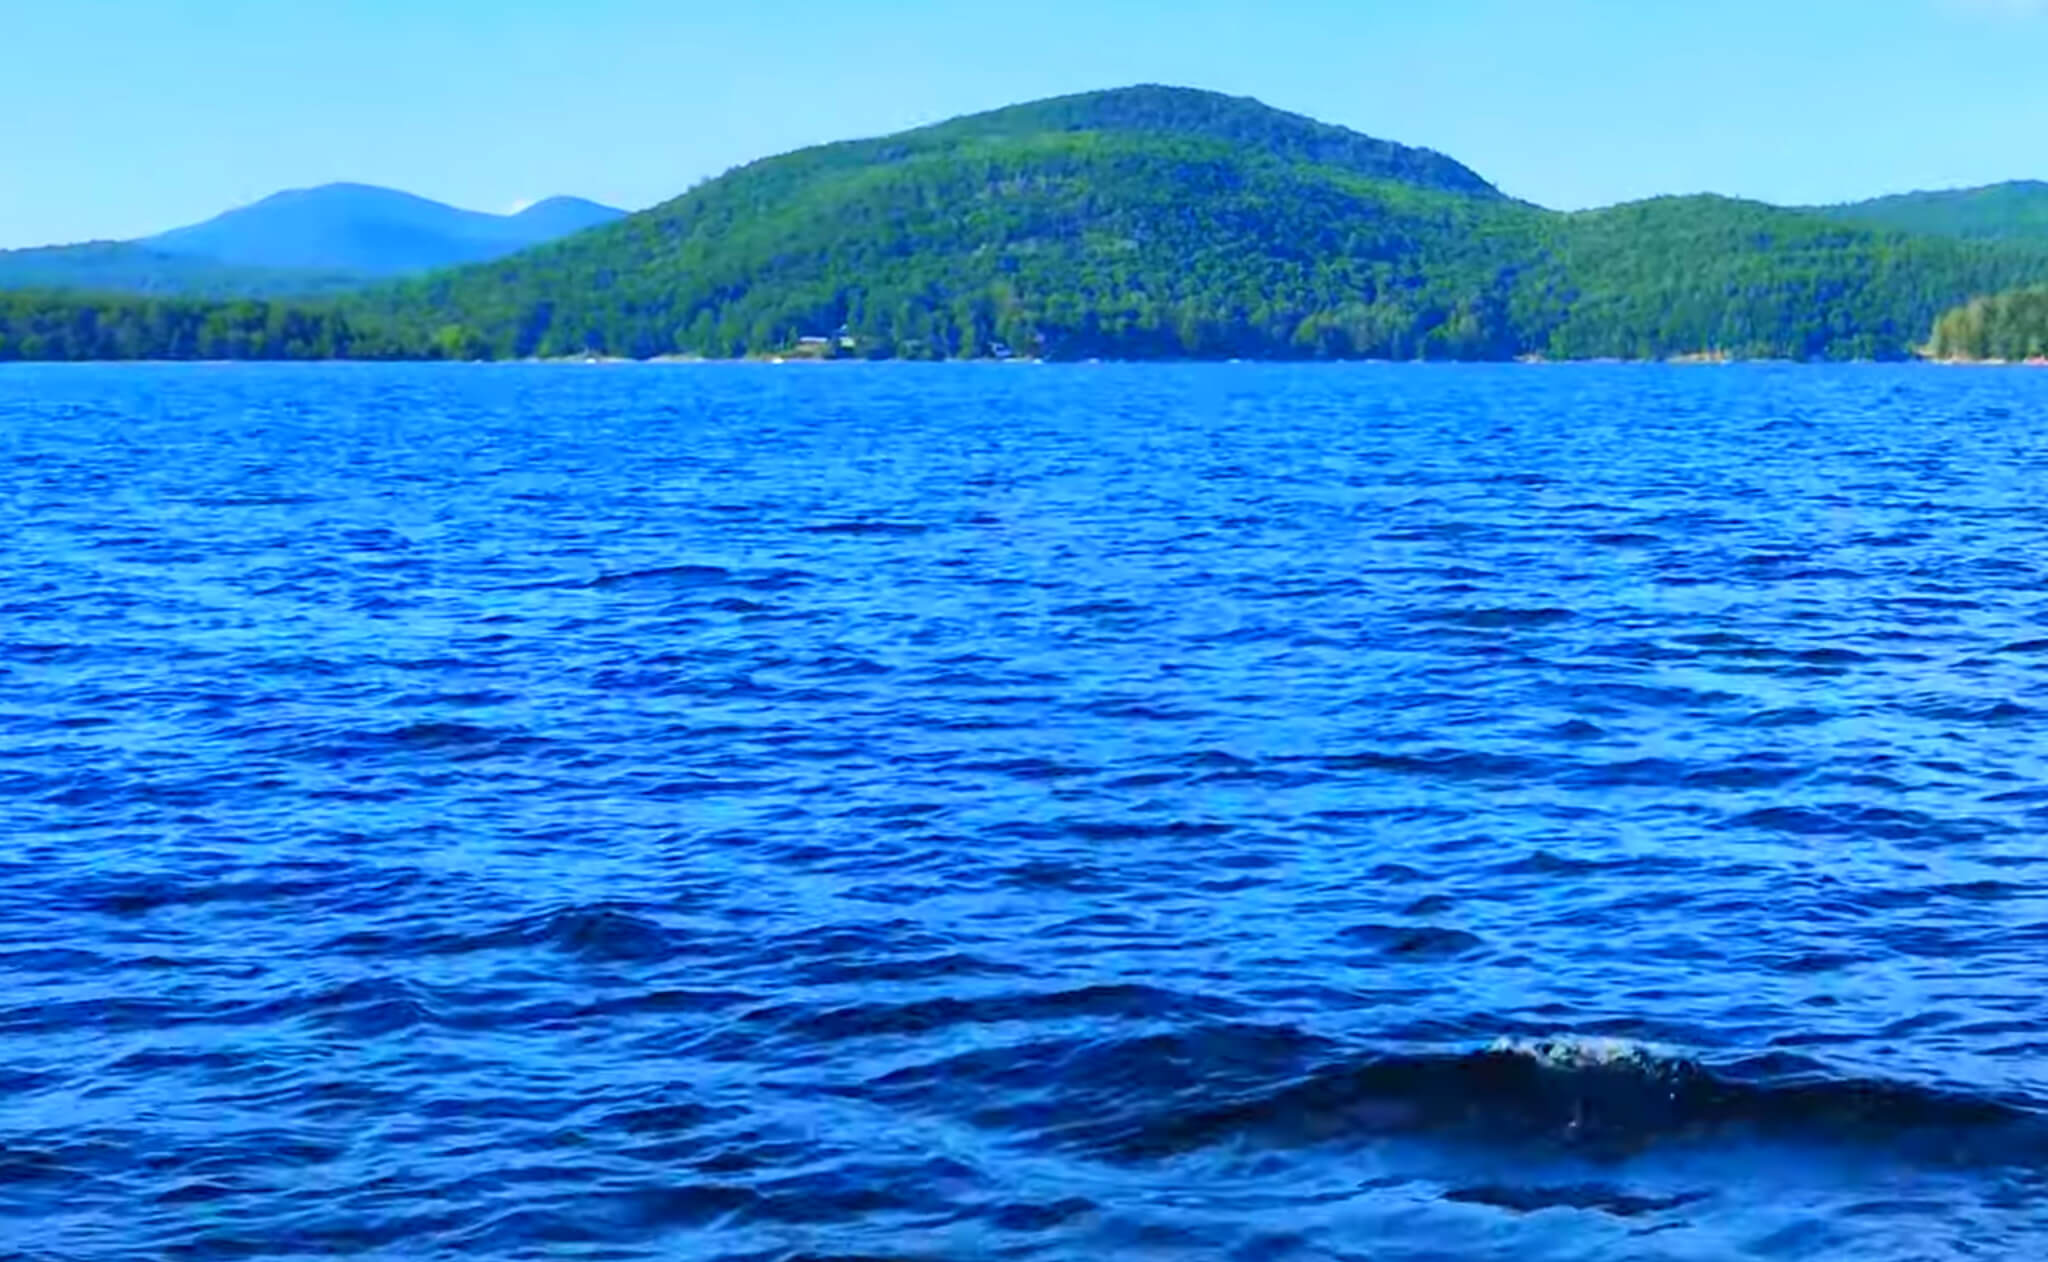 Great-Sacandaga-Lake-Fishing-Report-Guide-New-York-NY-03